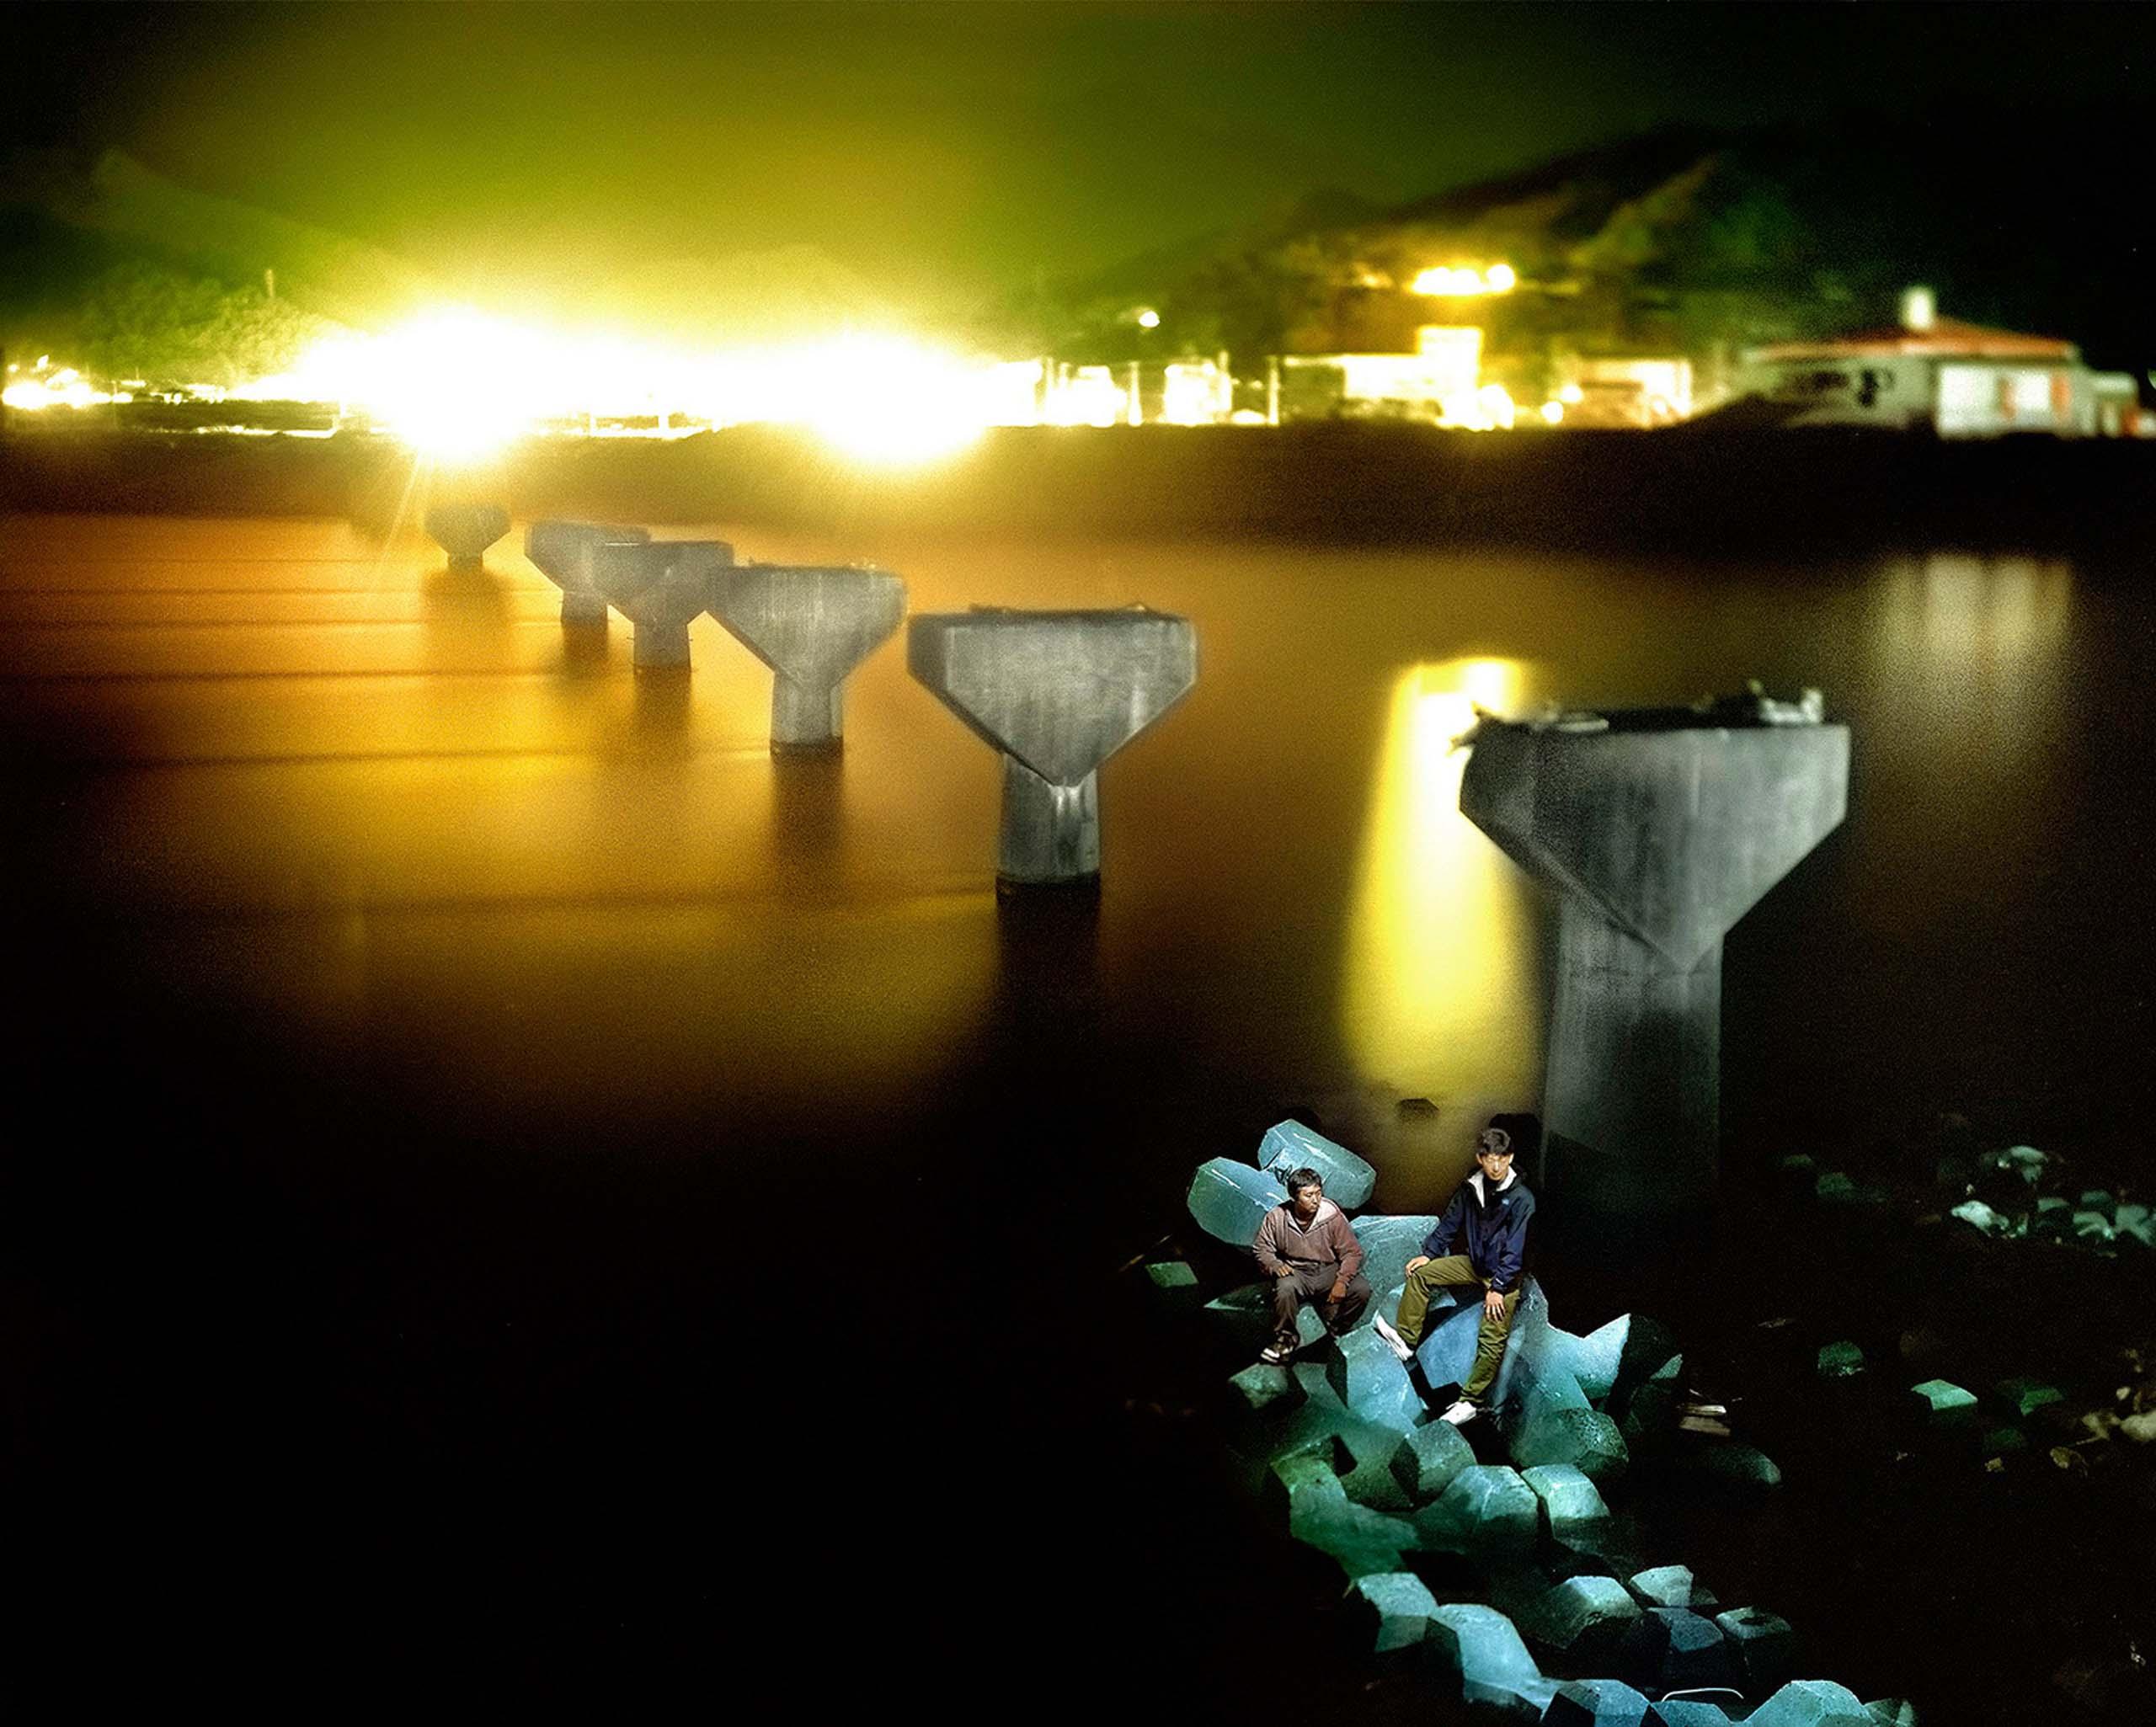 Railway Bridge from the series Otsuchi Future Memories